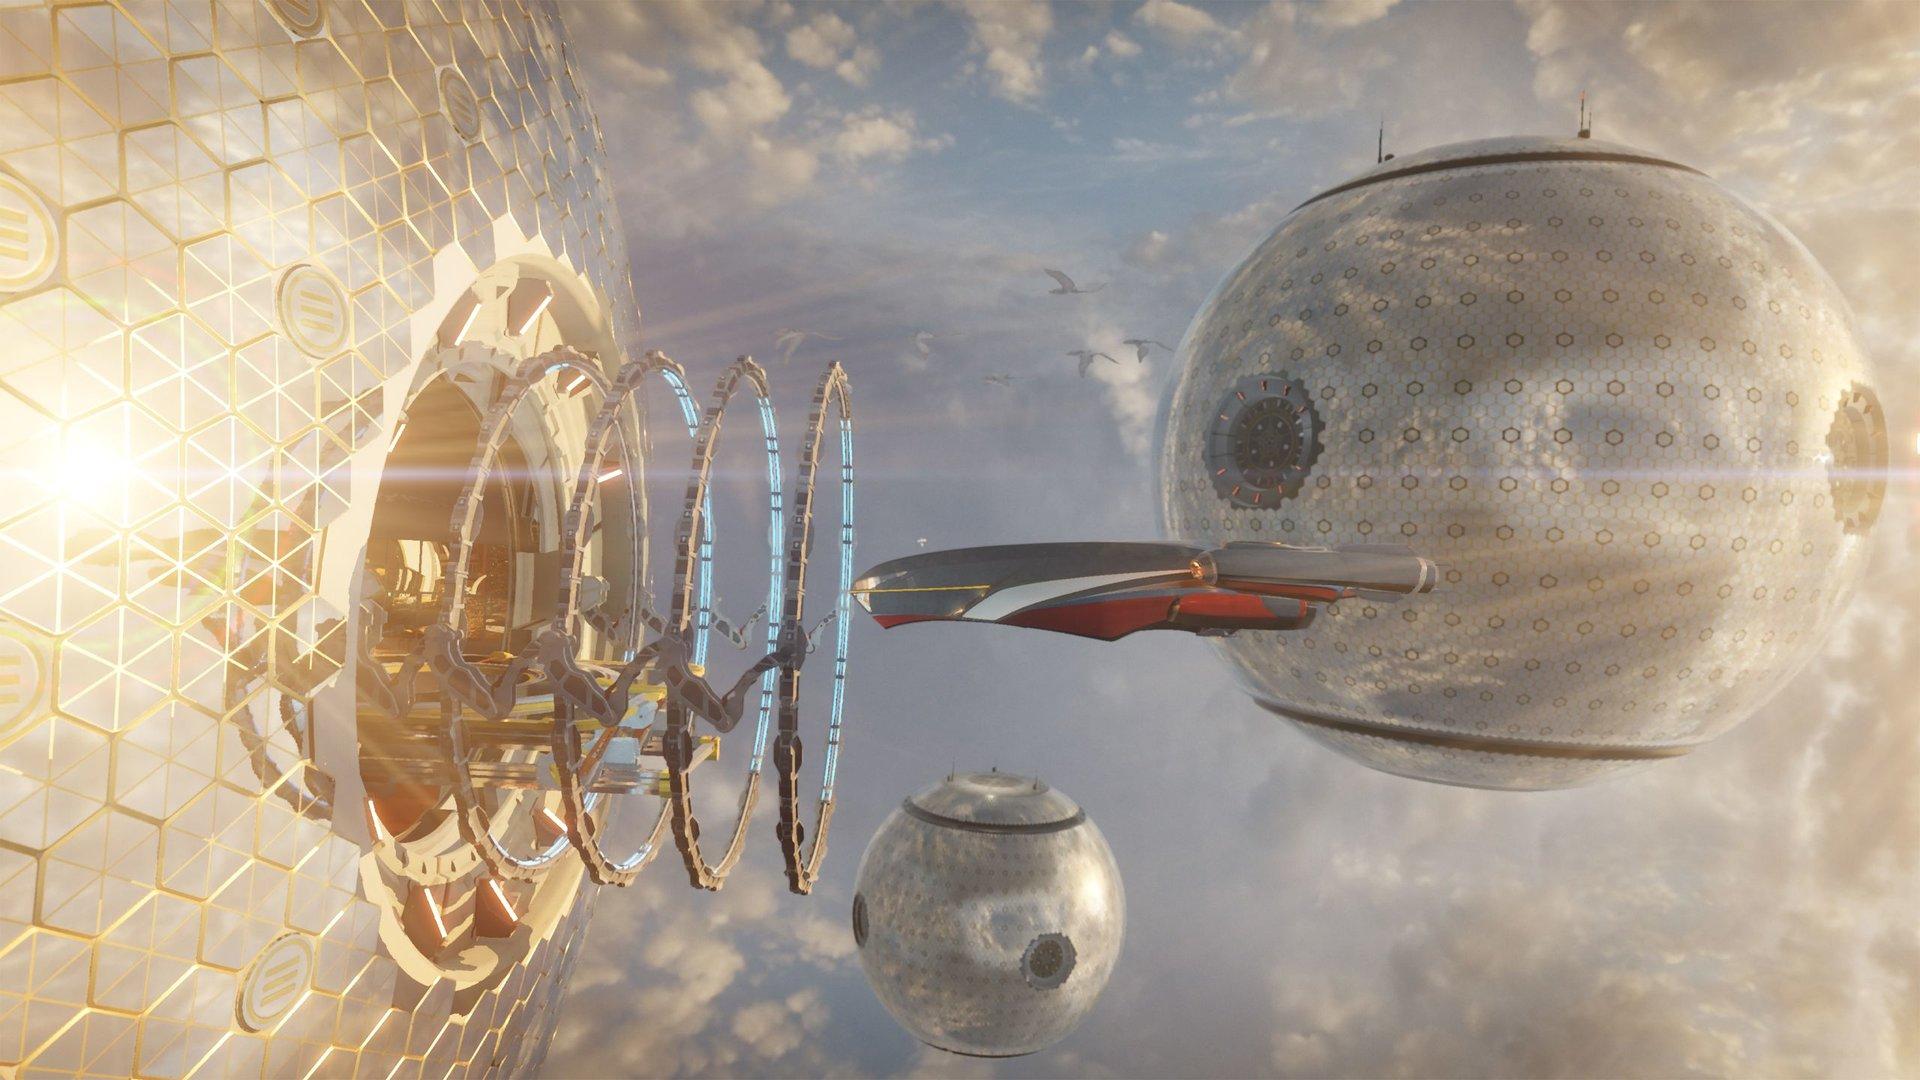 Raytracing-Benchmark: 3DMark Port Royal